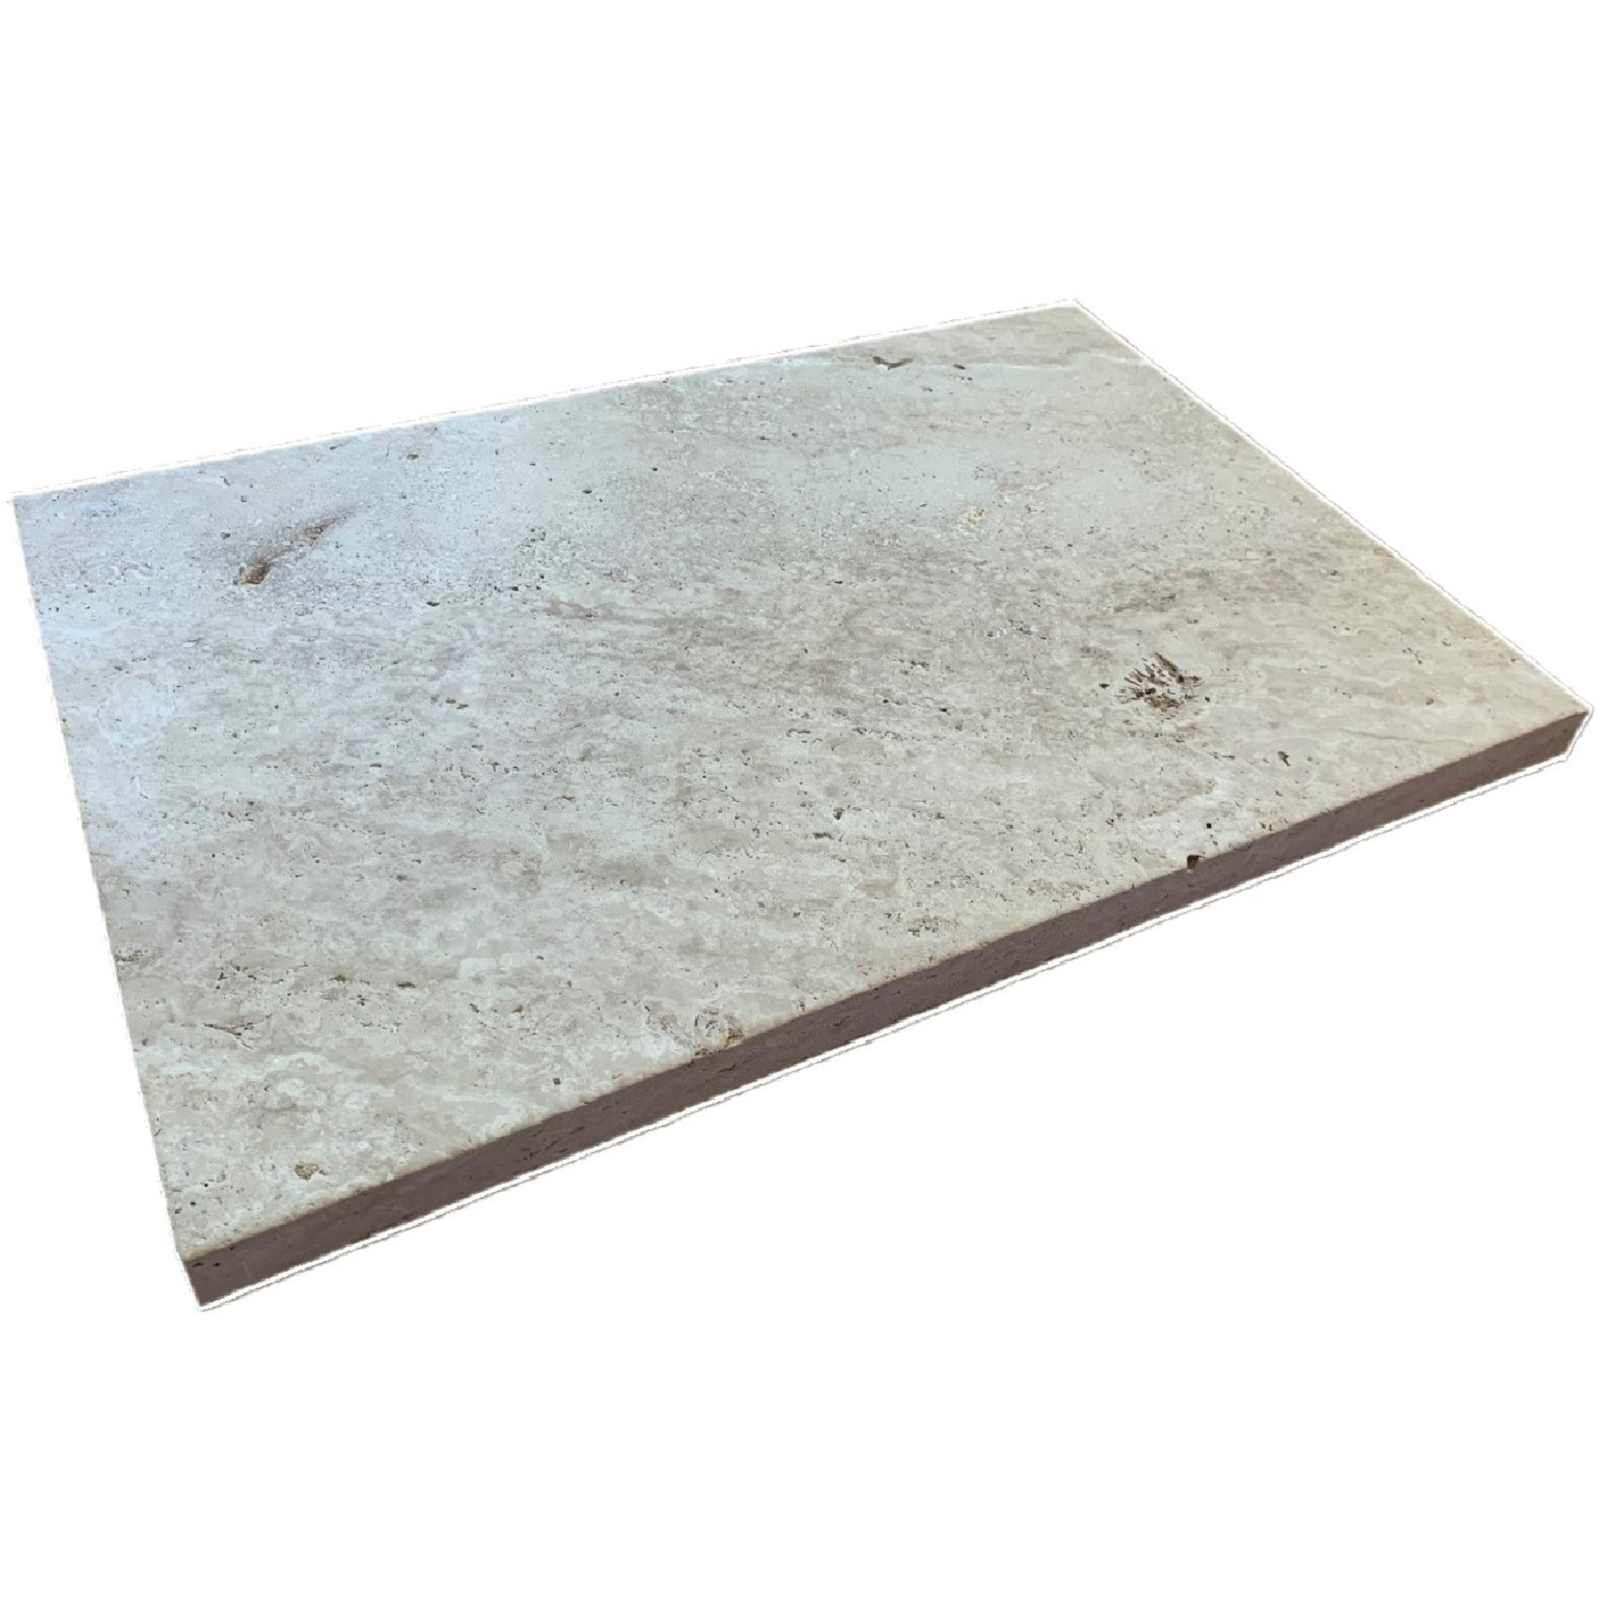 610 x 406 x 30mm Travertine Natural Stone Paver